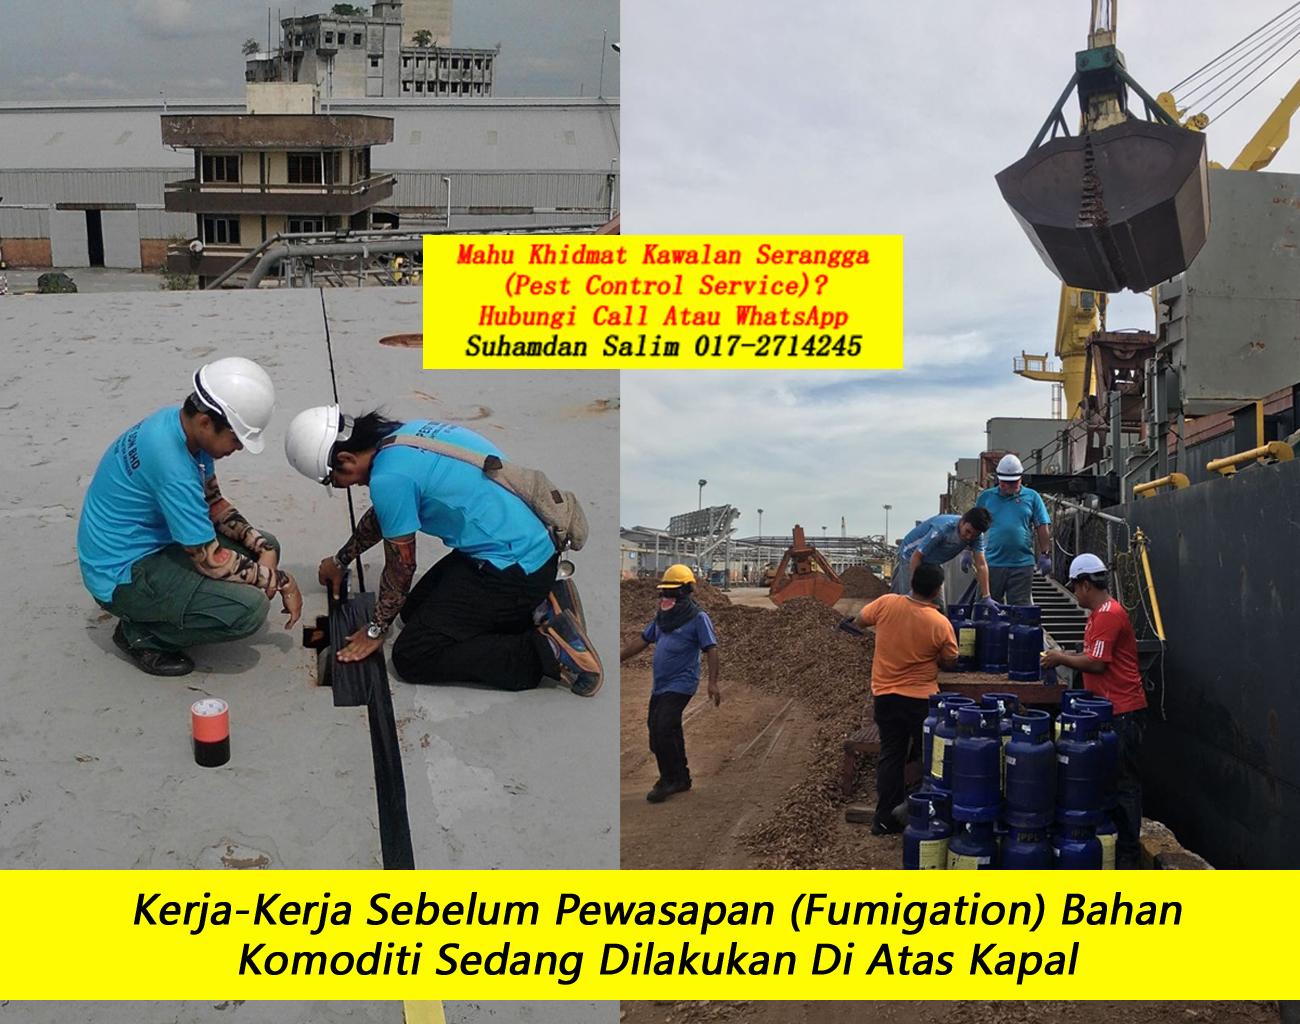 fumigation service fumigator berlesen kerja pewasapan syarikat company fumigation berlesen di masalah anai-anai Kampung Datuk Keramat kl taman taman perumahan kawasan perindustrian